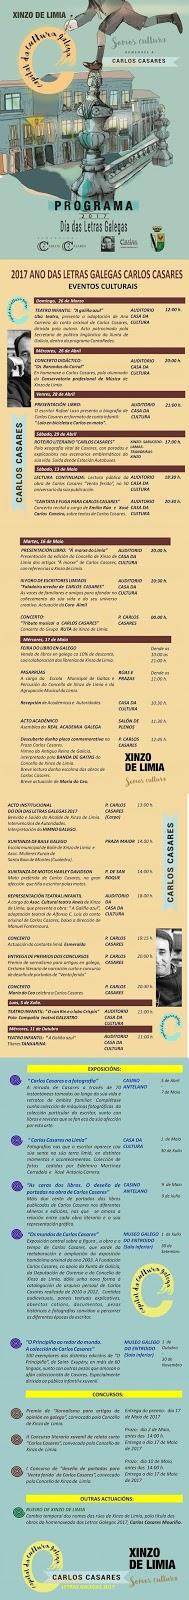 http://www.xinzodelimia.es/articulo/concello/programa-completo-letras-galegas-2017/20170501123013001264.html